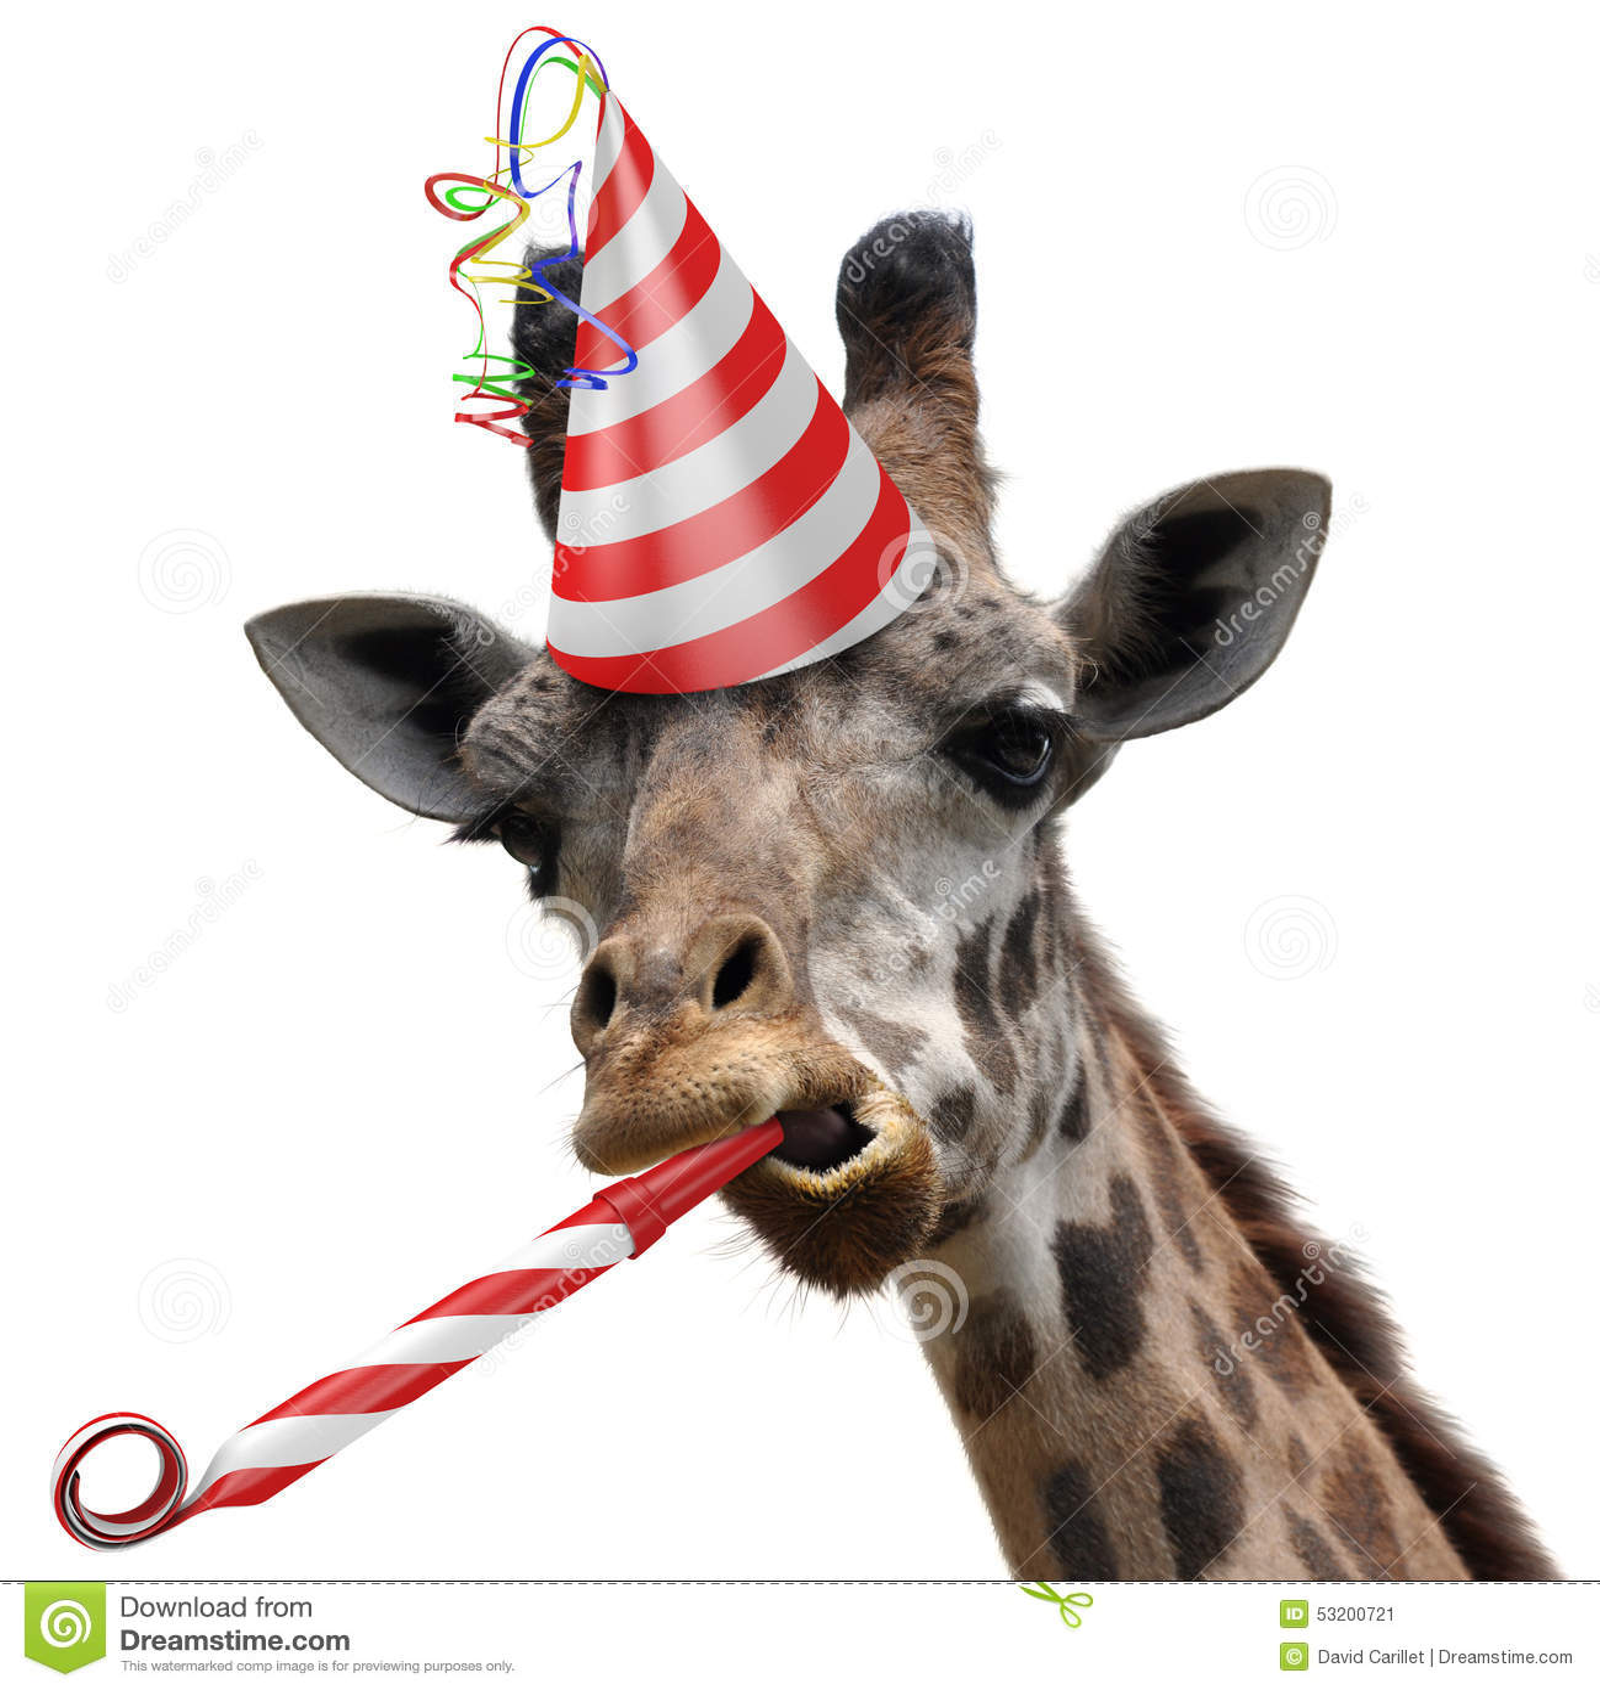 Giraffe Cake Cake Ideas And Designs